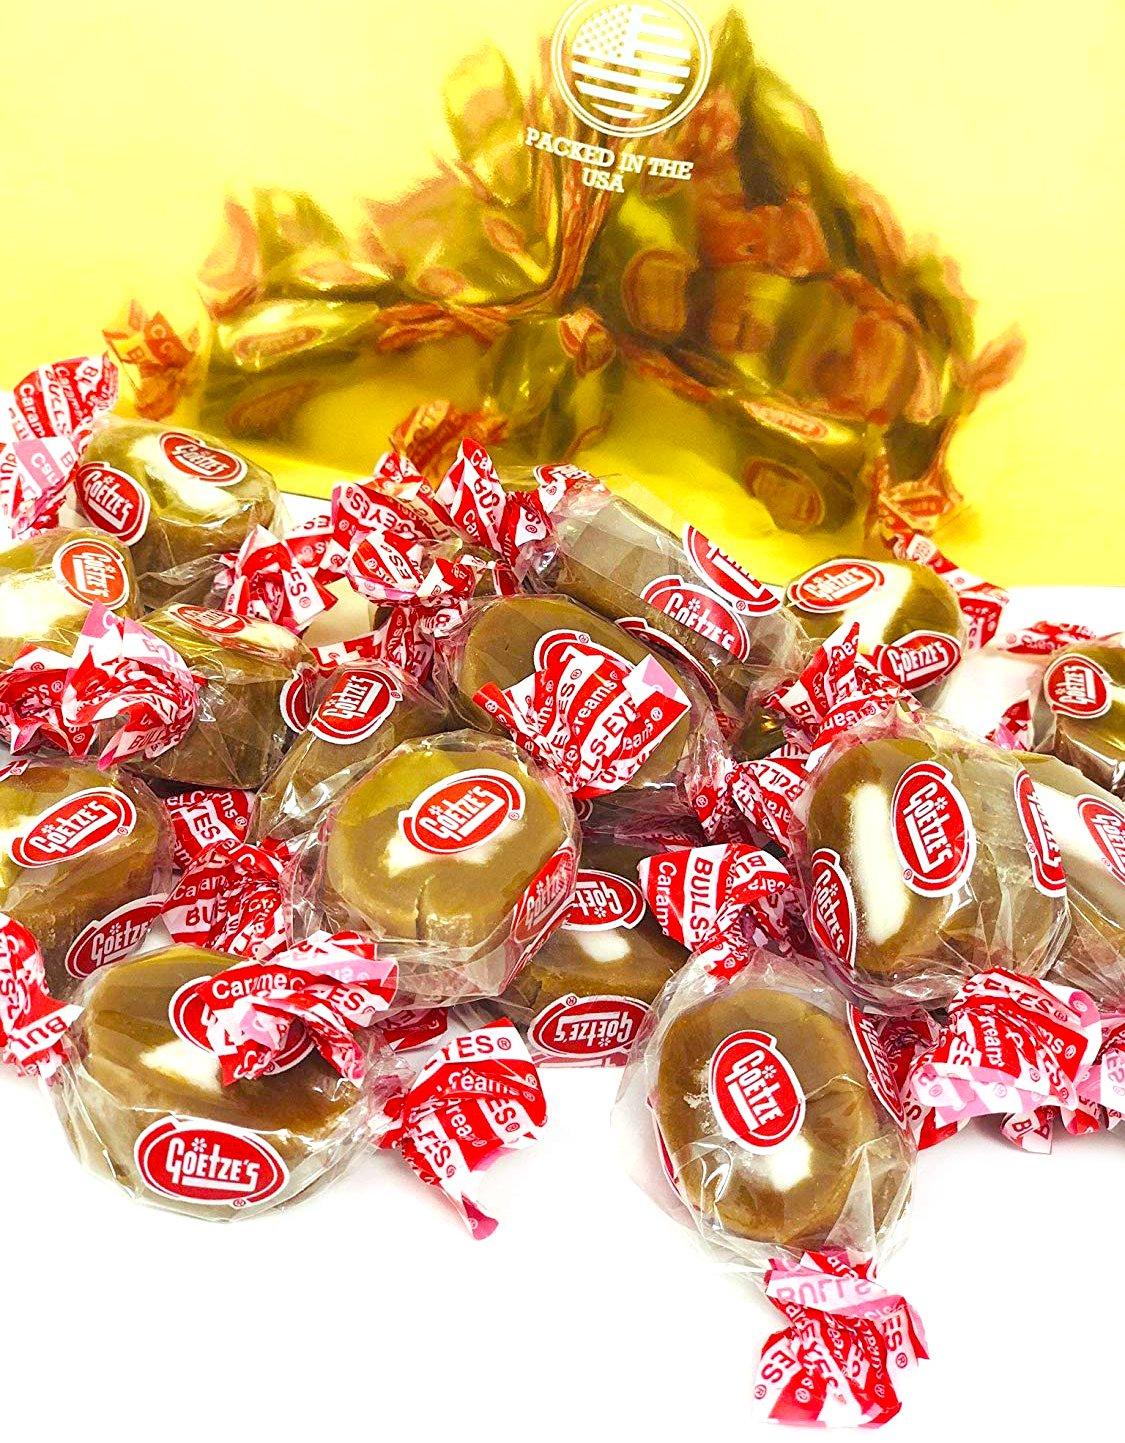 Goetze's Original Vanilla Caramel Creams - Retro Candy (4Lb)